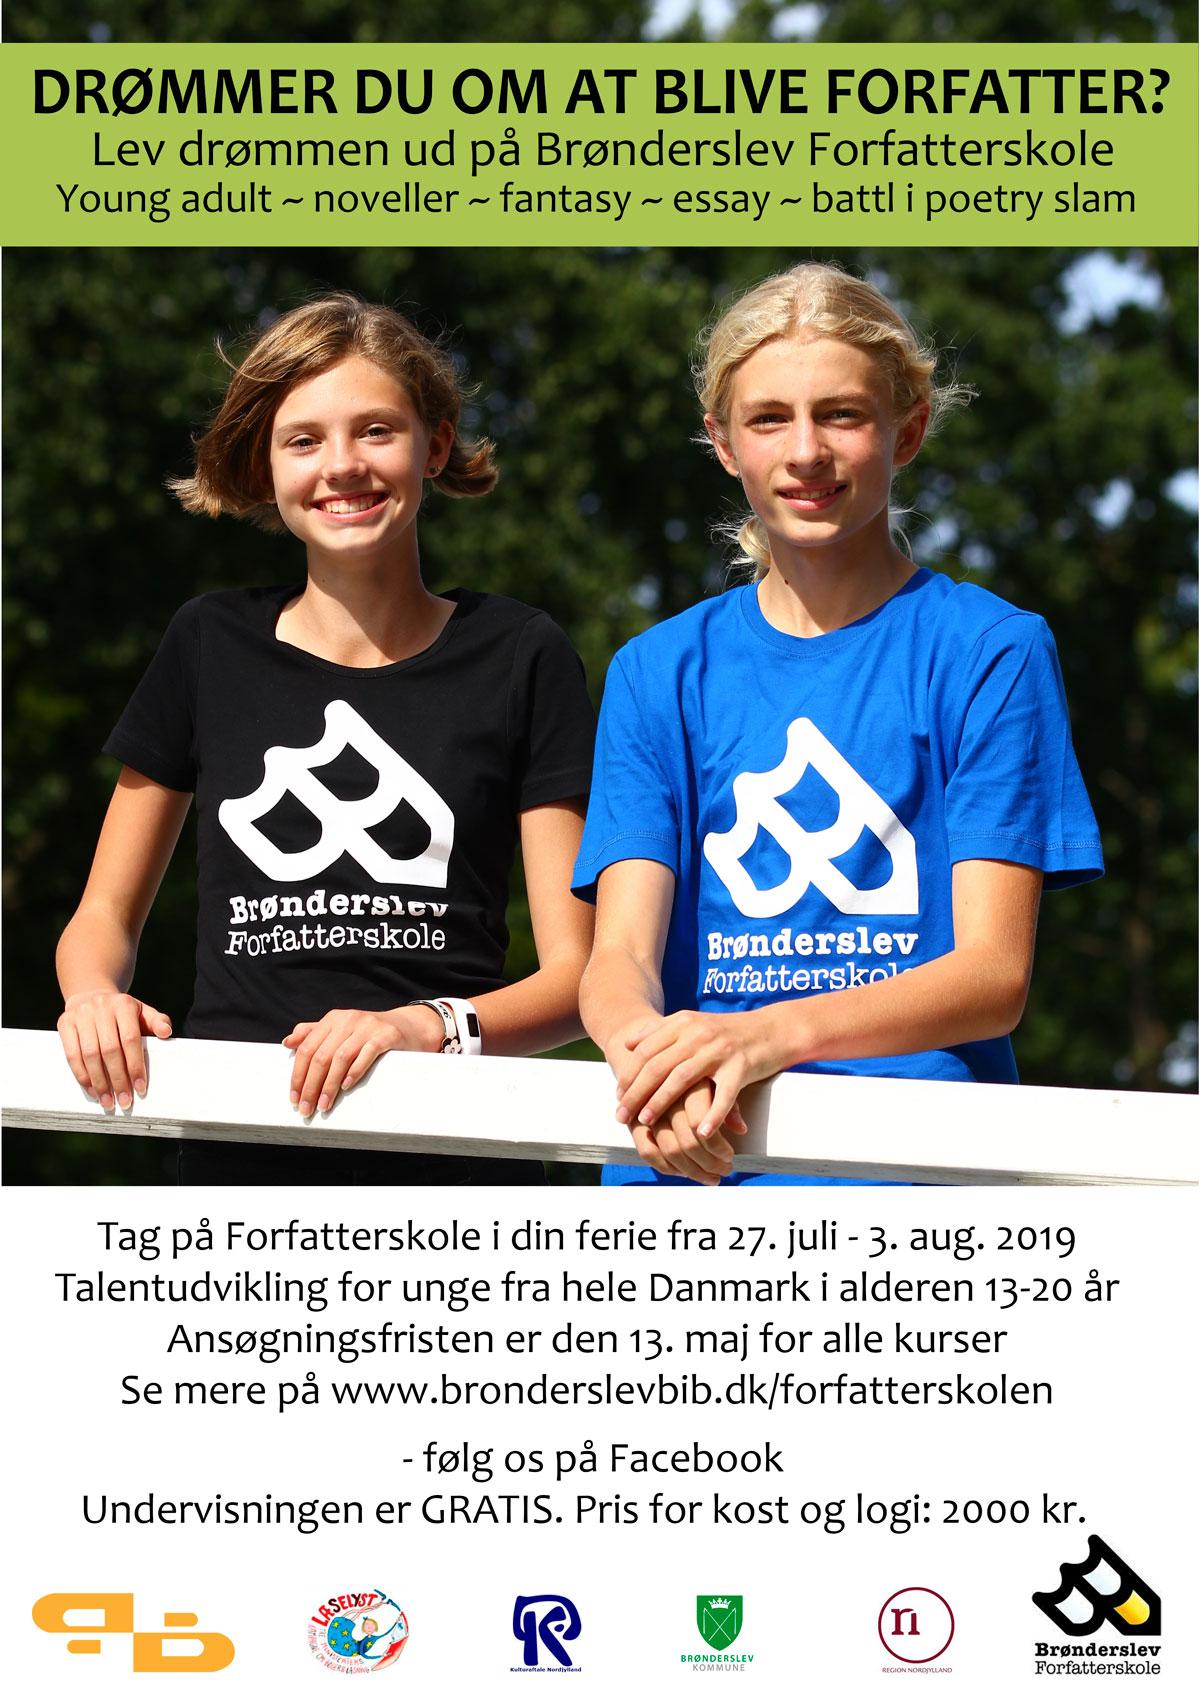 Brønderslev Forfatterskole 2019